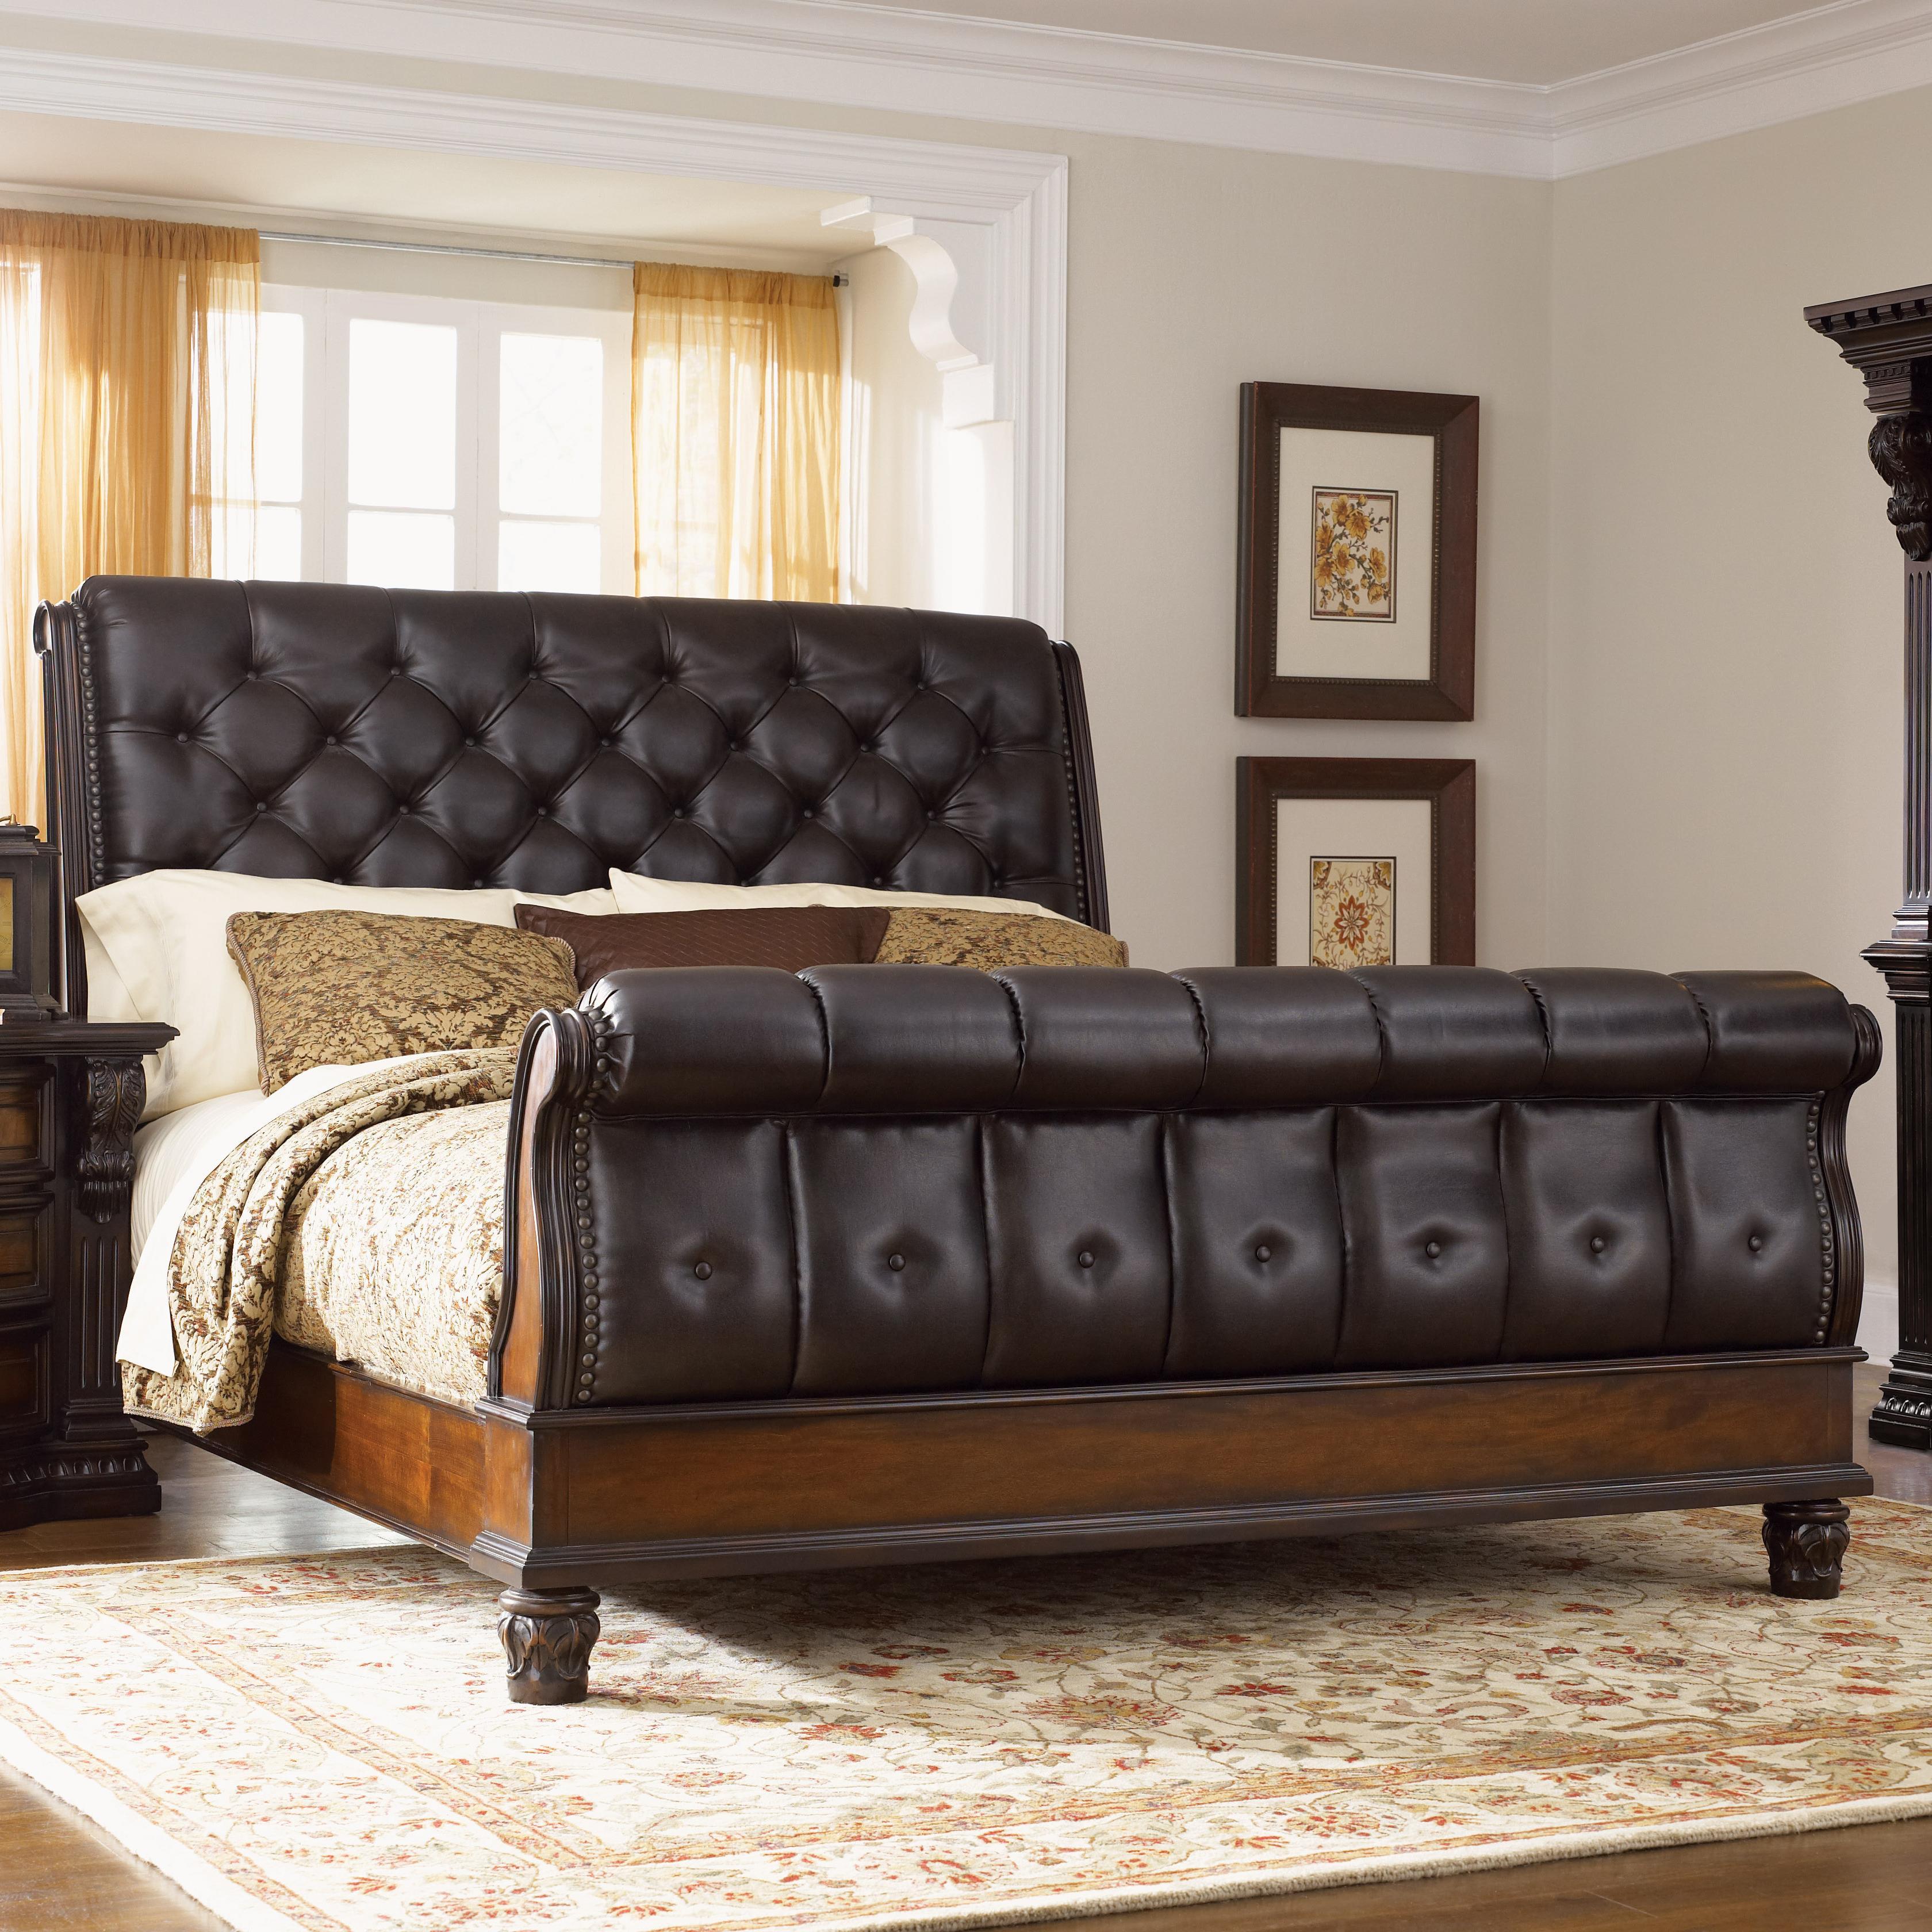 Fairmont Designs Grand Estates King Sleigh Bed W Leather